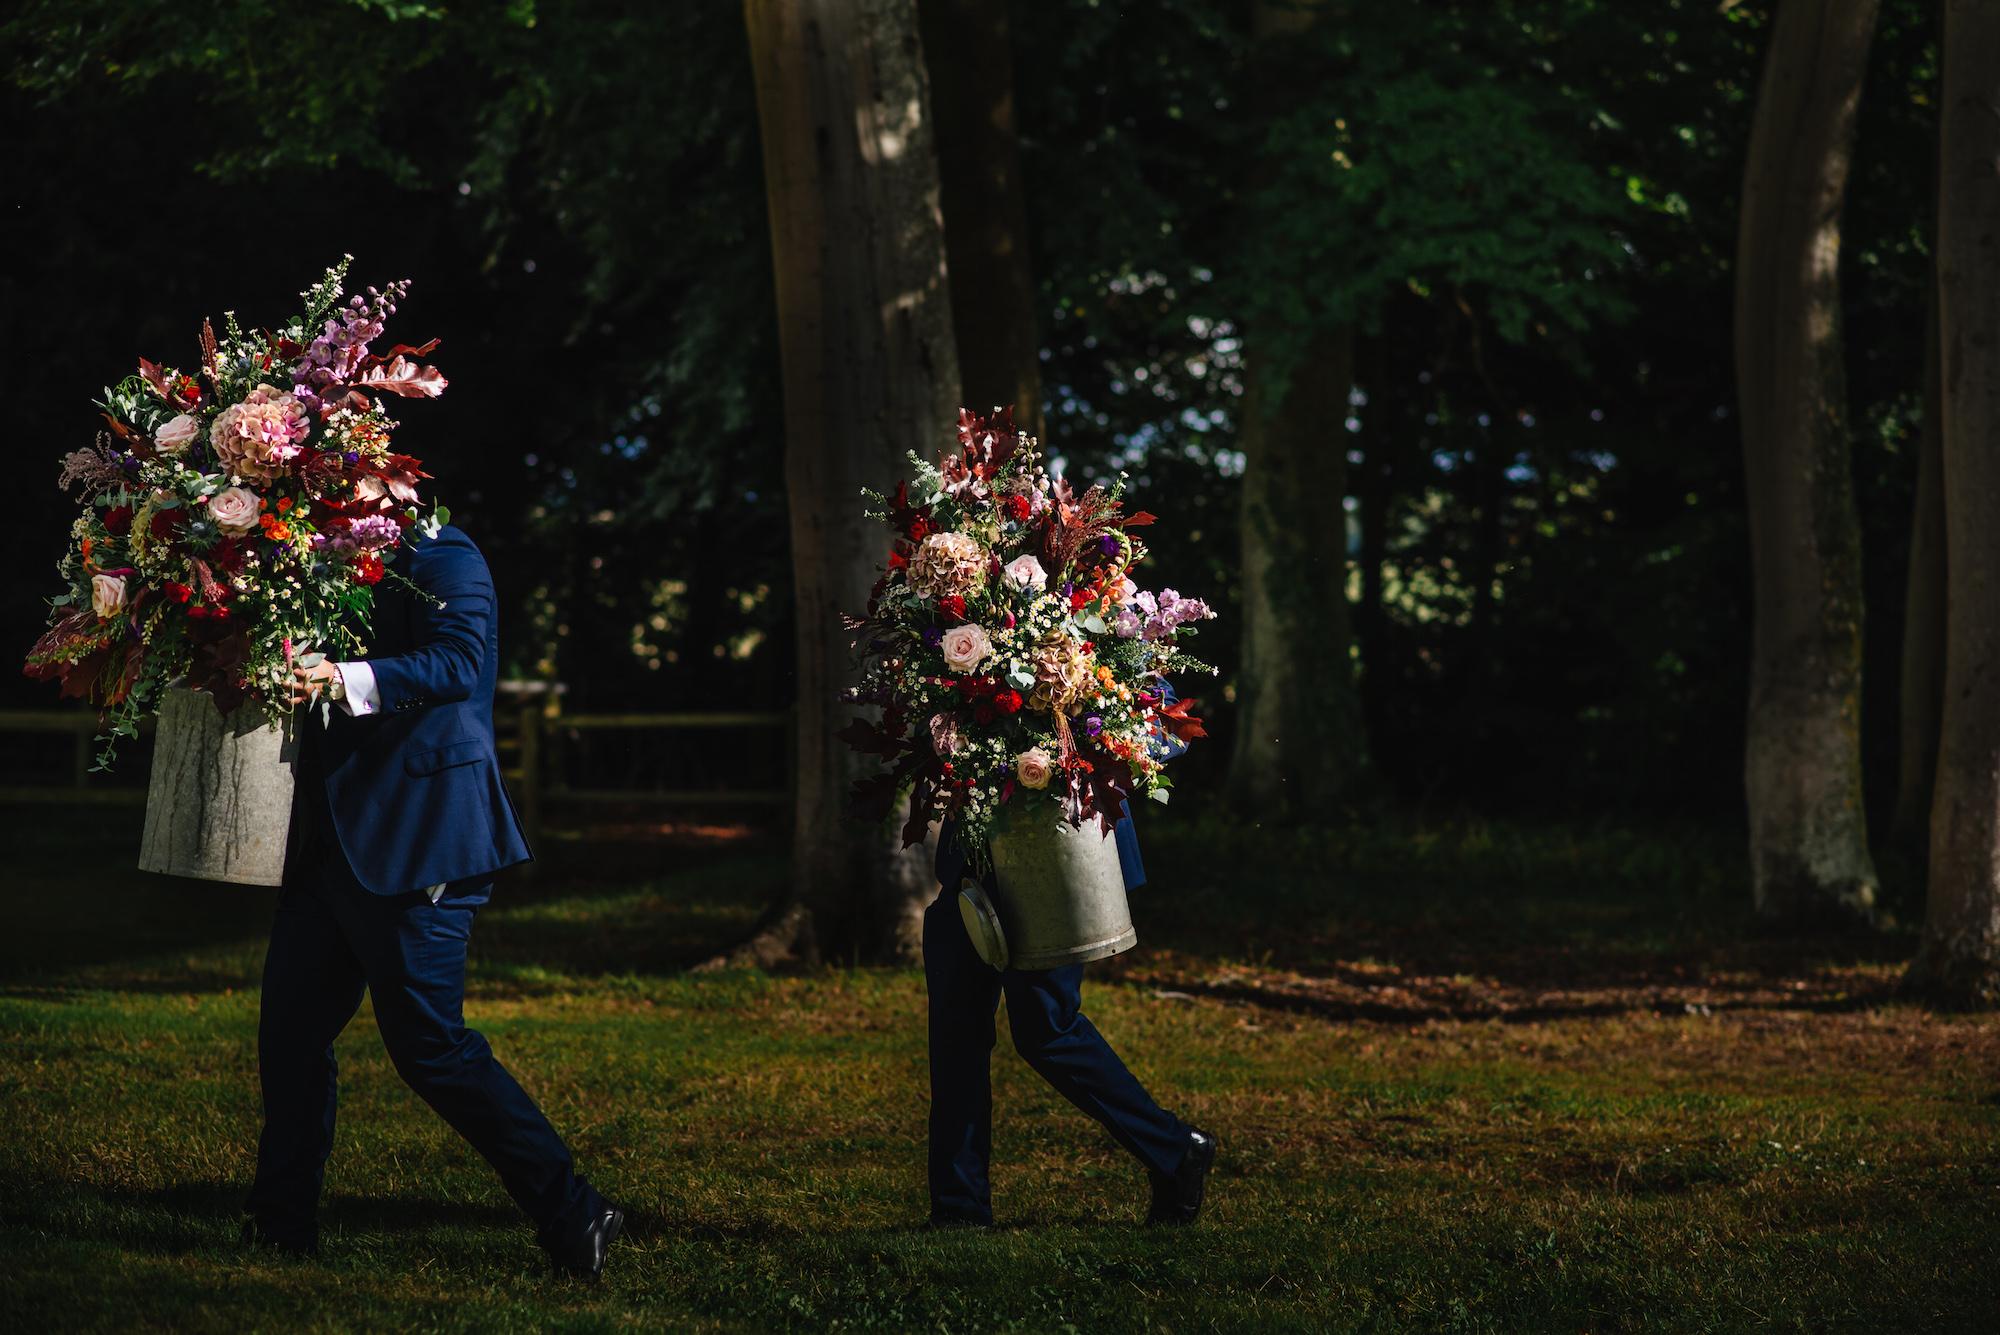 13_Rushall_manor_wiltshire_wedding_photography_bride_groom_summer_flowers.jpg